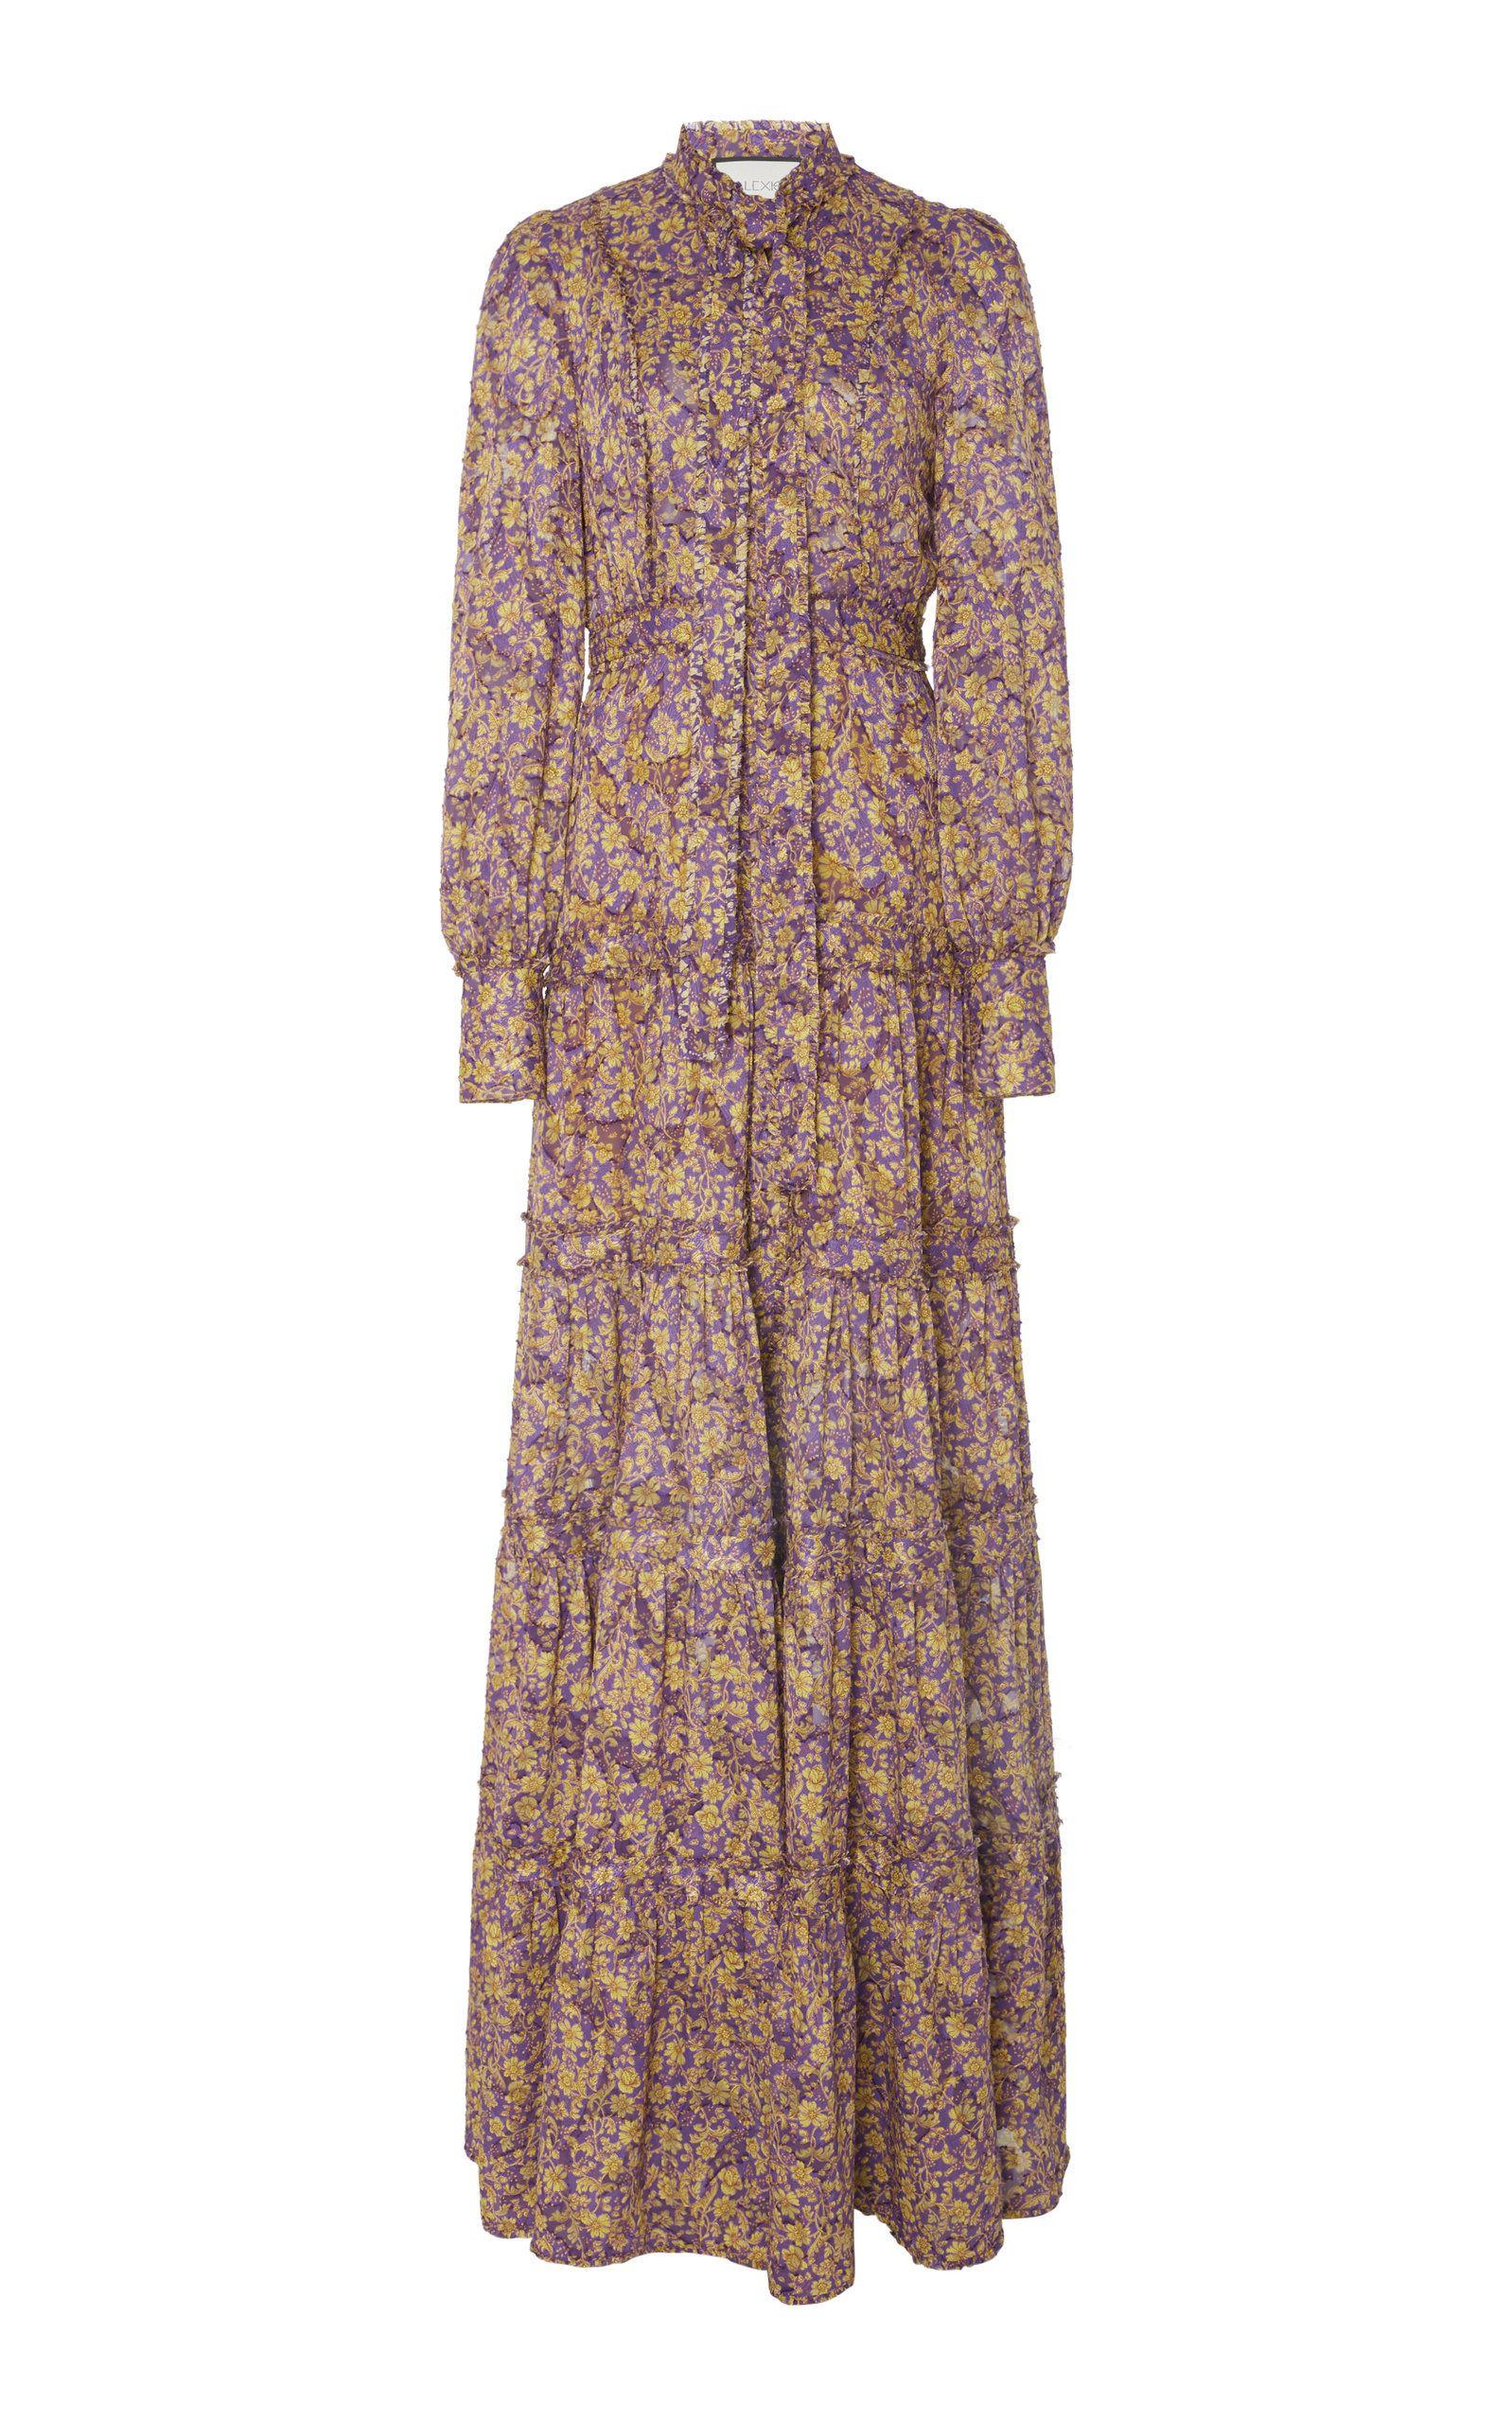 e593aecf181d42 Alexis Margeaux Floral Maxi Dress in 2019   fashion   Floral maxi ...